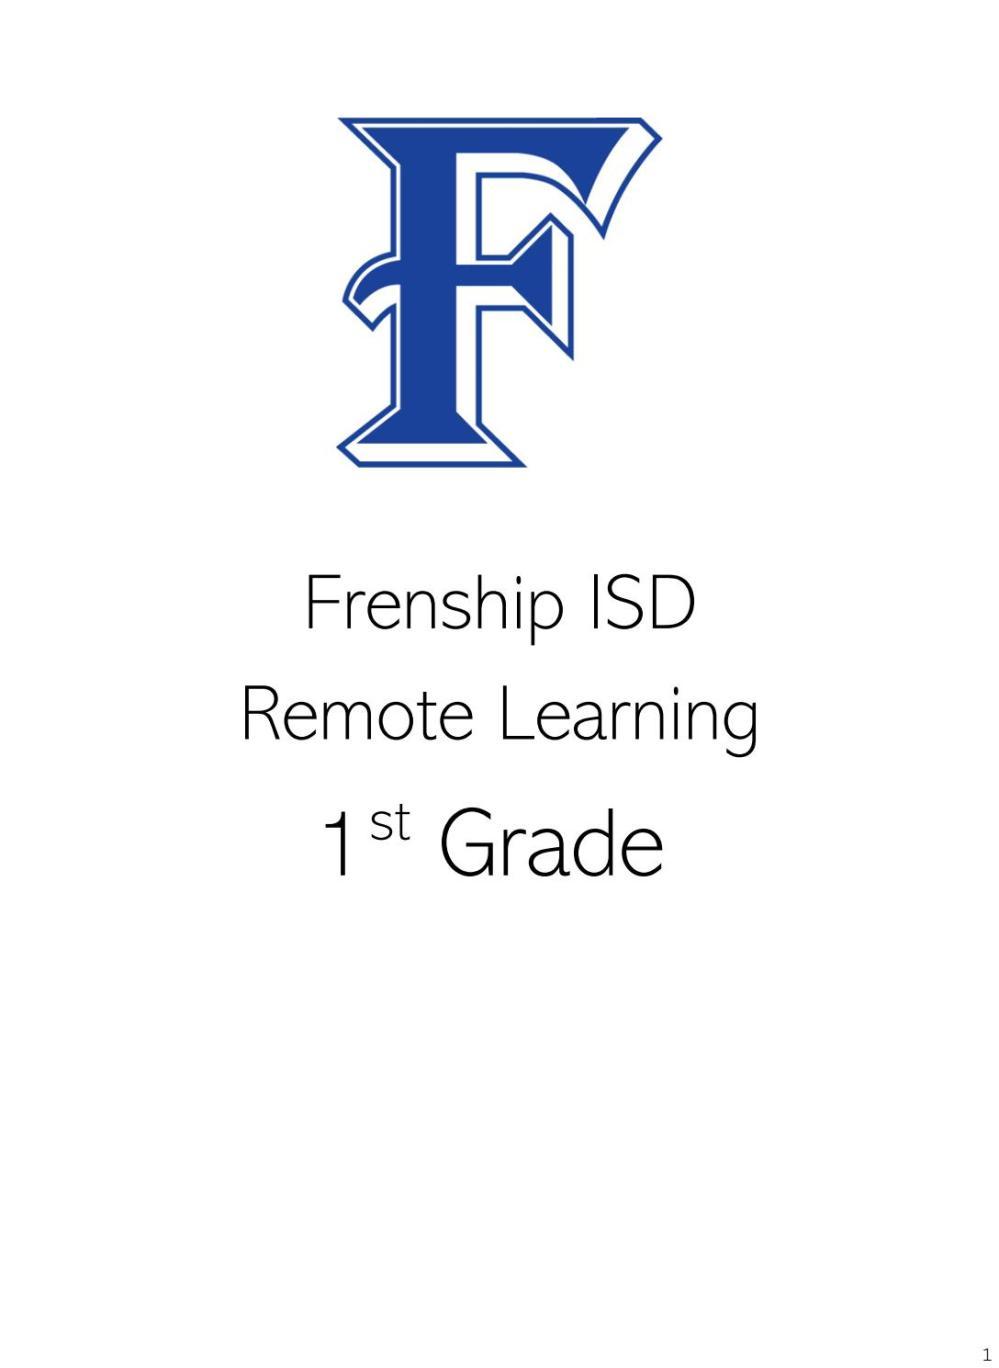 medium resolution of 1st Grade Remote Learning May 11-15 by frenshipisd - issuu